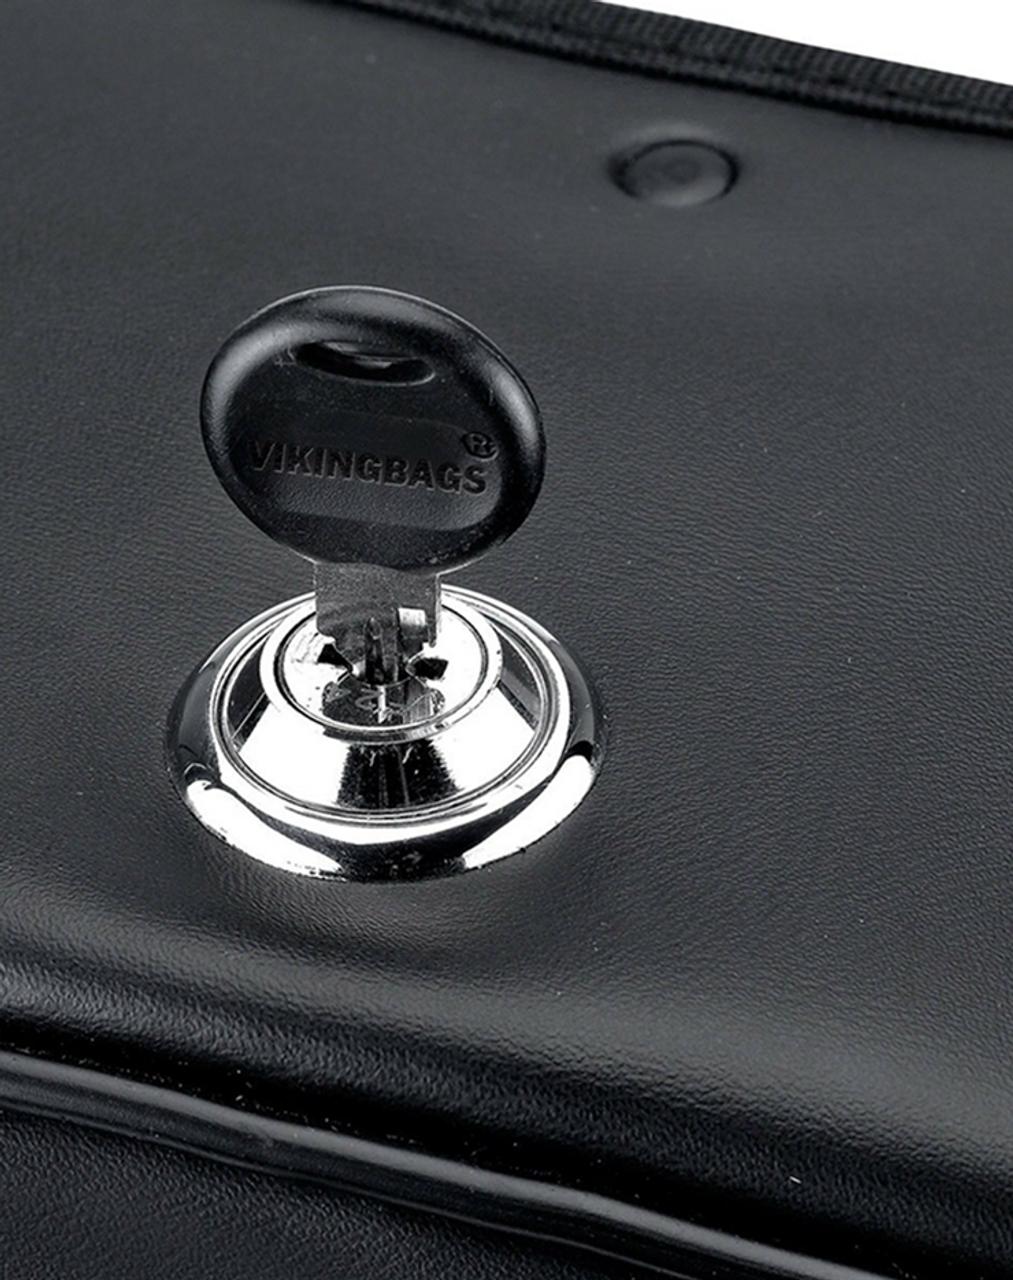 Suzuki Intruder 1500 VL1500 Charger Slanted Studded Medium Motorcycle Saddlebags Key Lock View